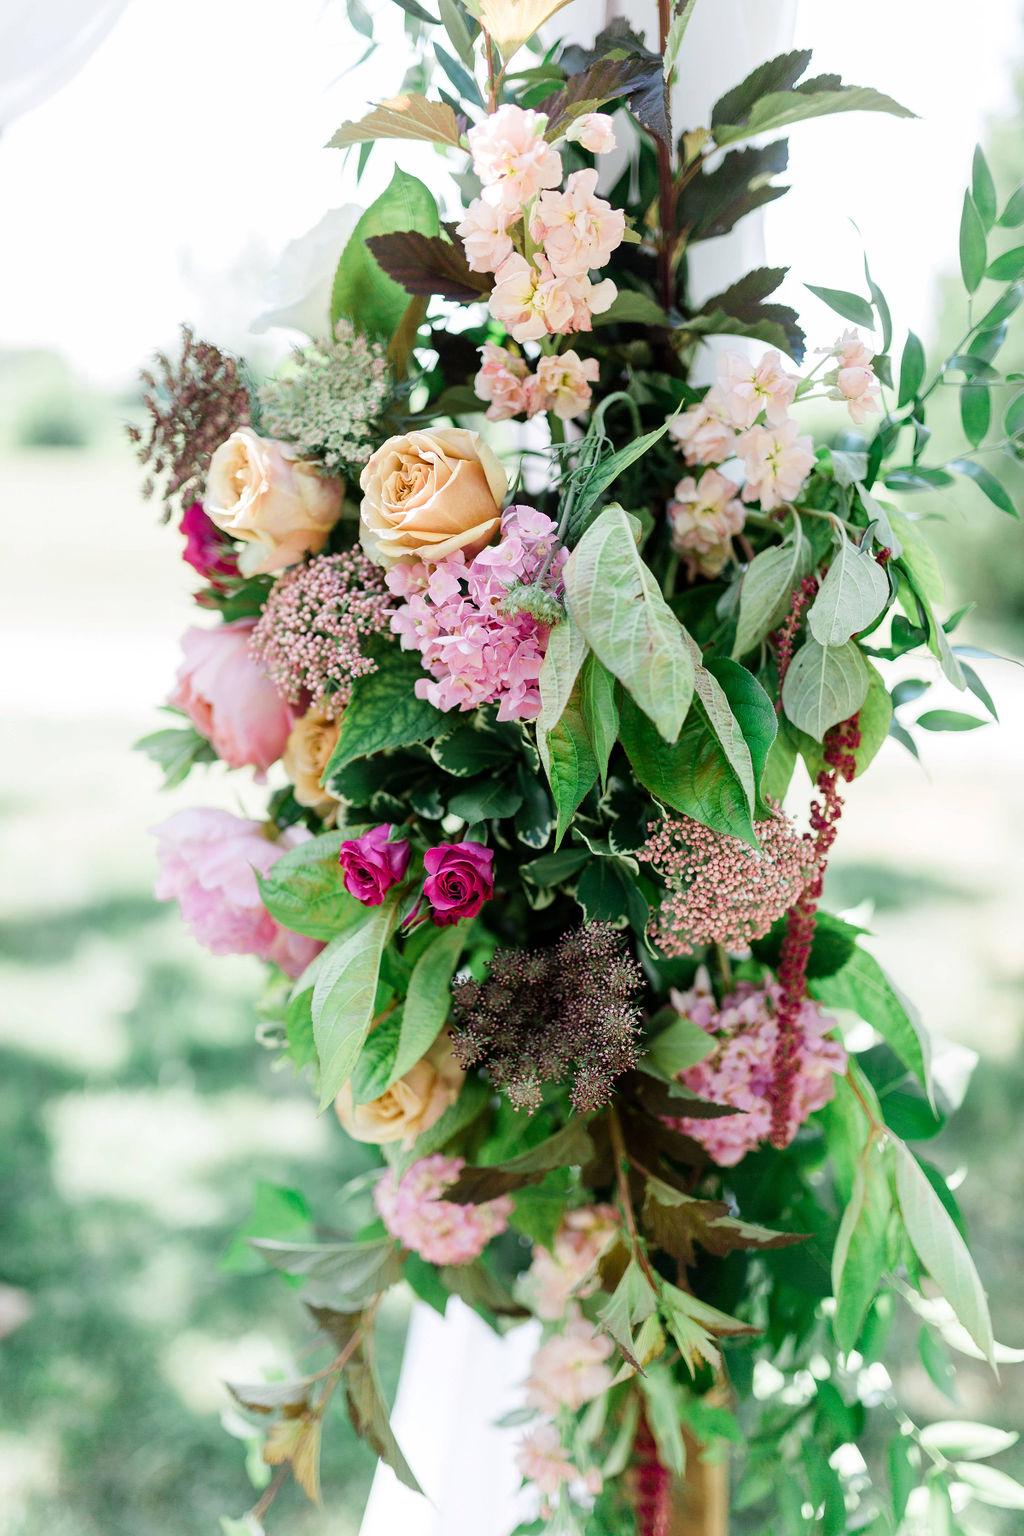 Kurtz-Orchards-Niagara-on-the-Lake-Styled-Wedding-Session-Shotlife-Studio-Calderone-Co-Luxury-Events-Vineyard-Bride-06.JPG